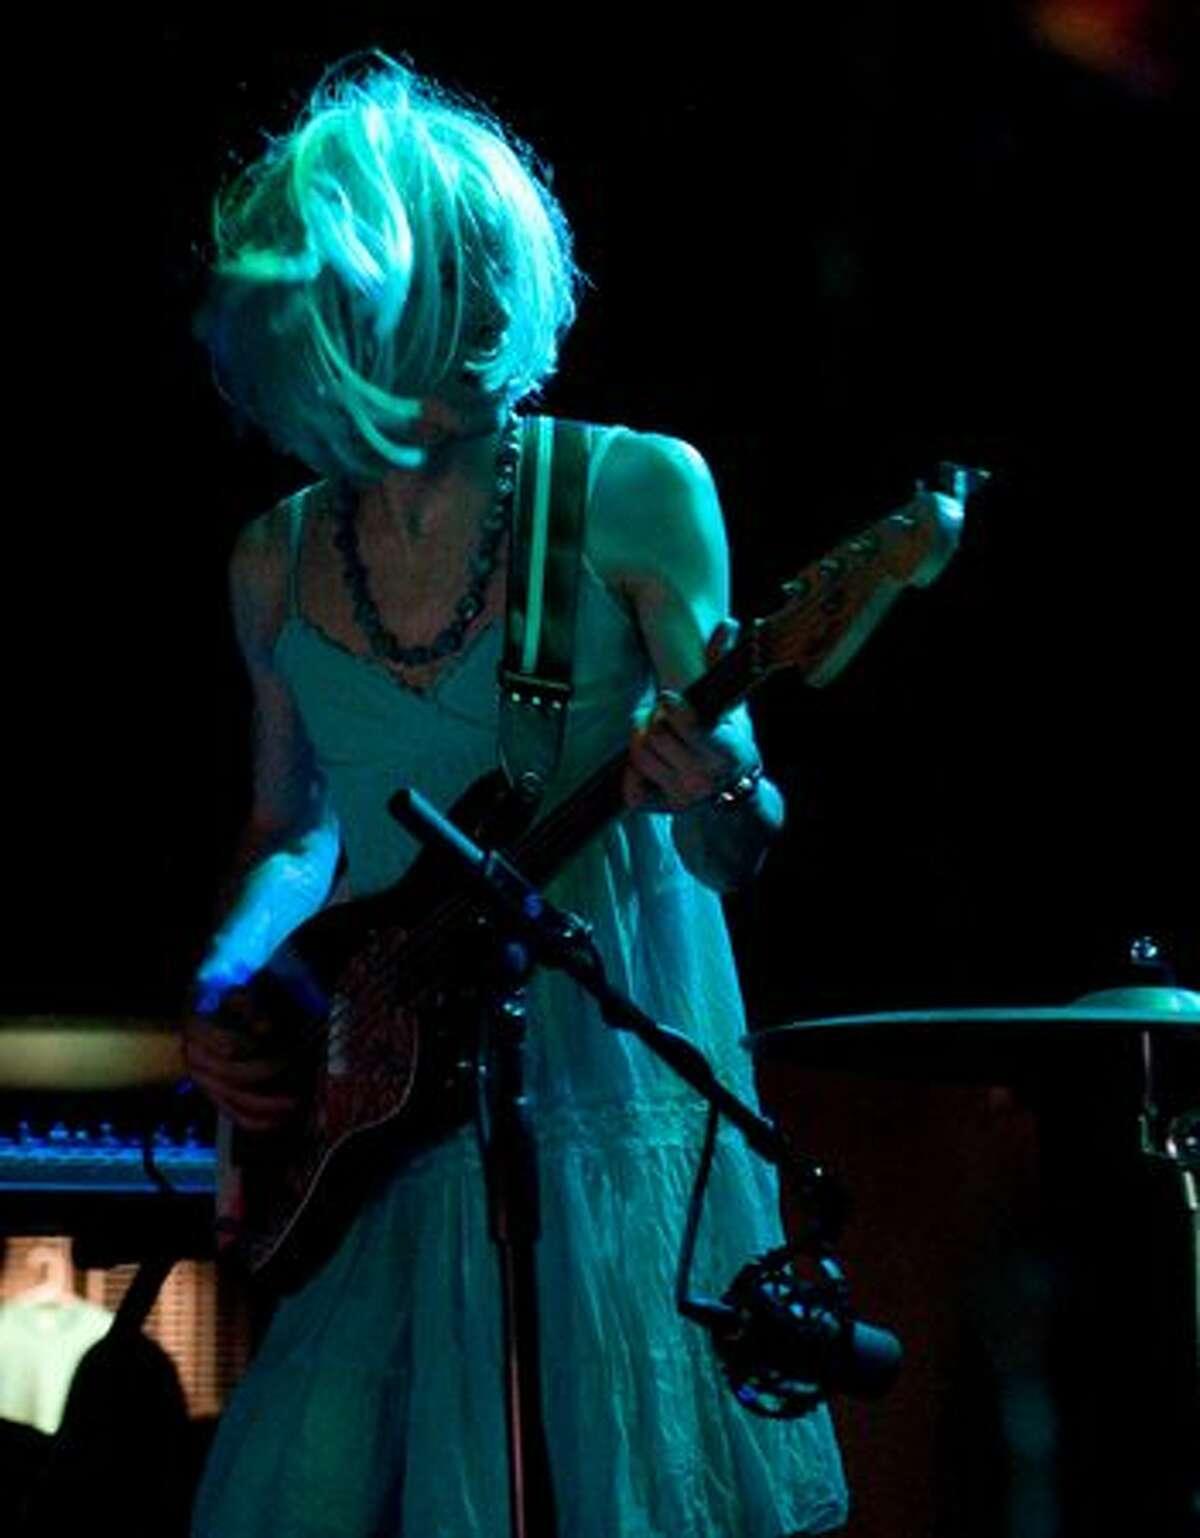 Portland band Starf***er perform at Neumos on May 10, 2010.